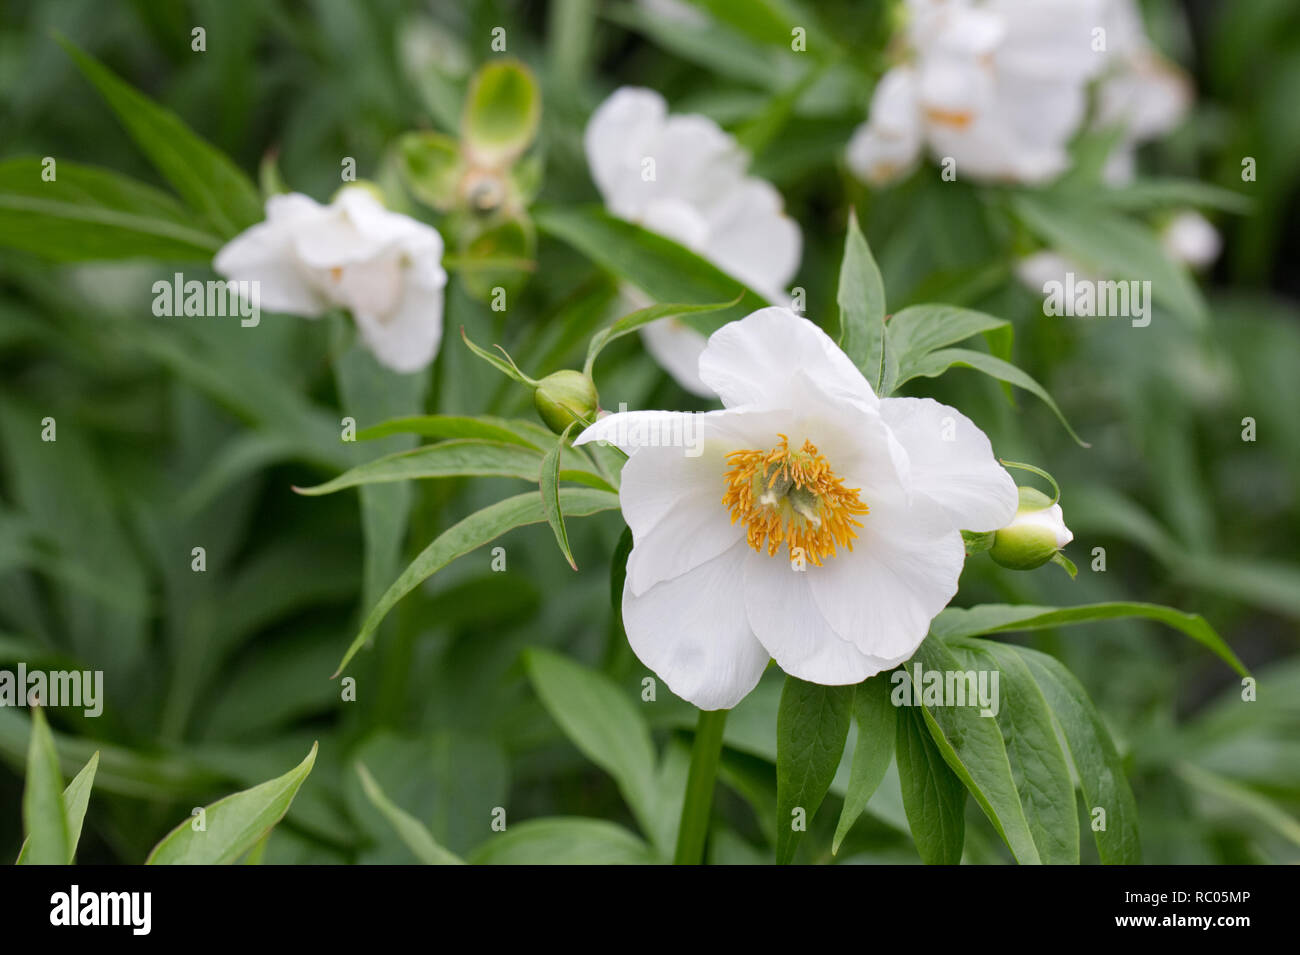 Paeonia emodi flowers in Spring. - Stock Image